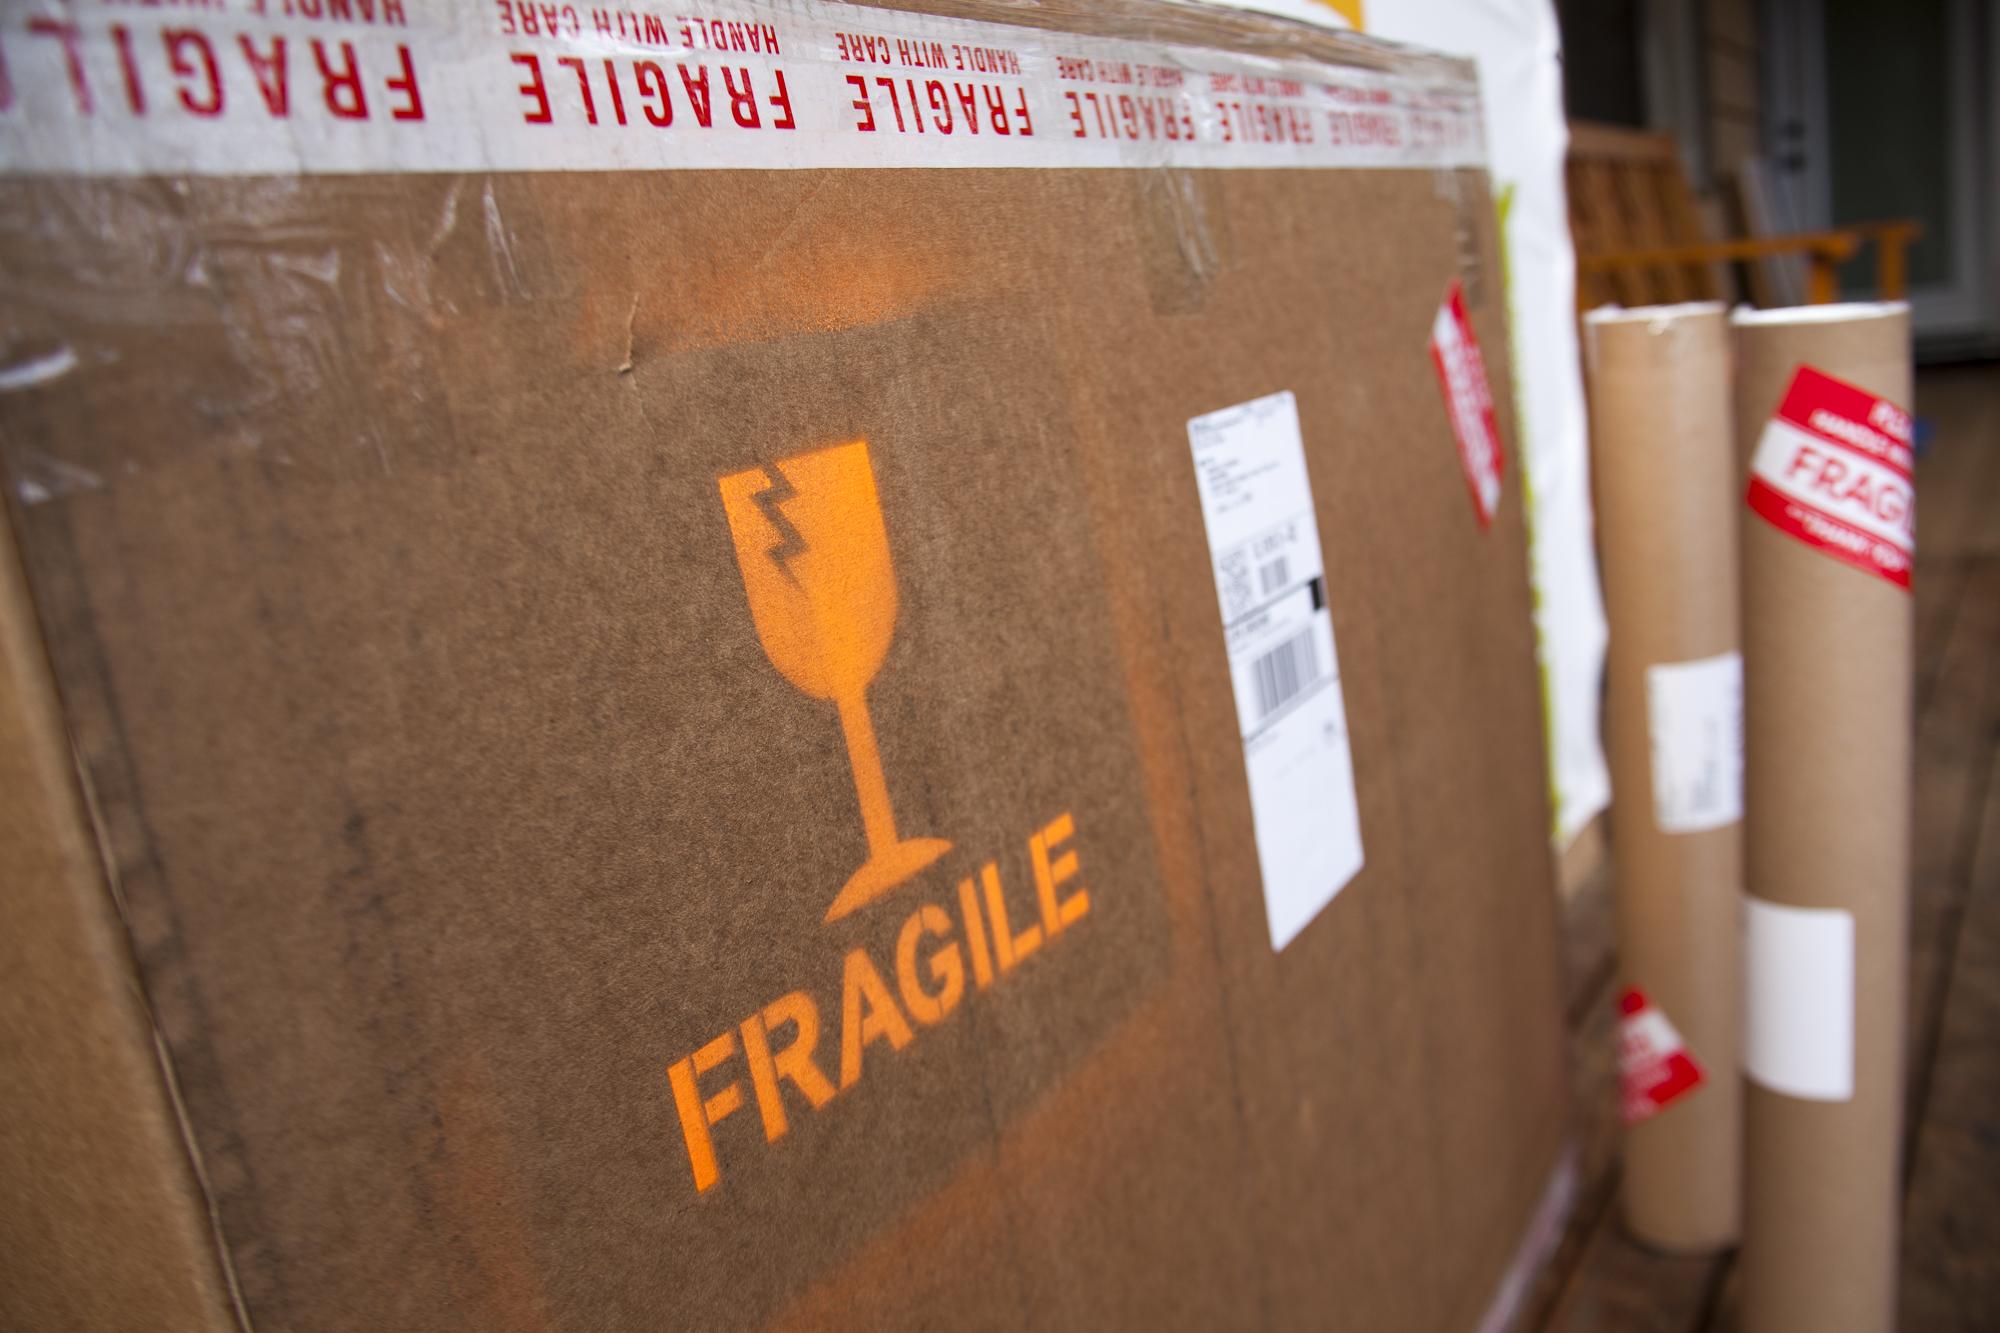 Shipping Info - Bellevue Fine Art ReproductionBellevue Fine